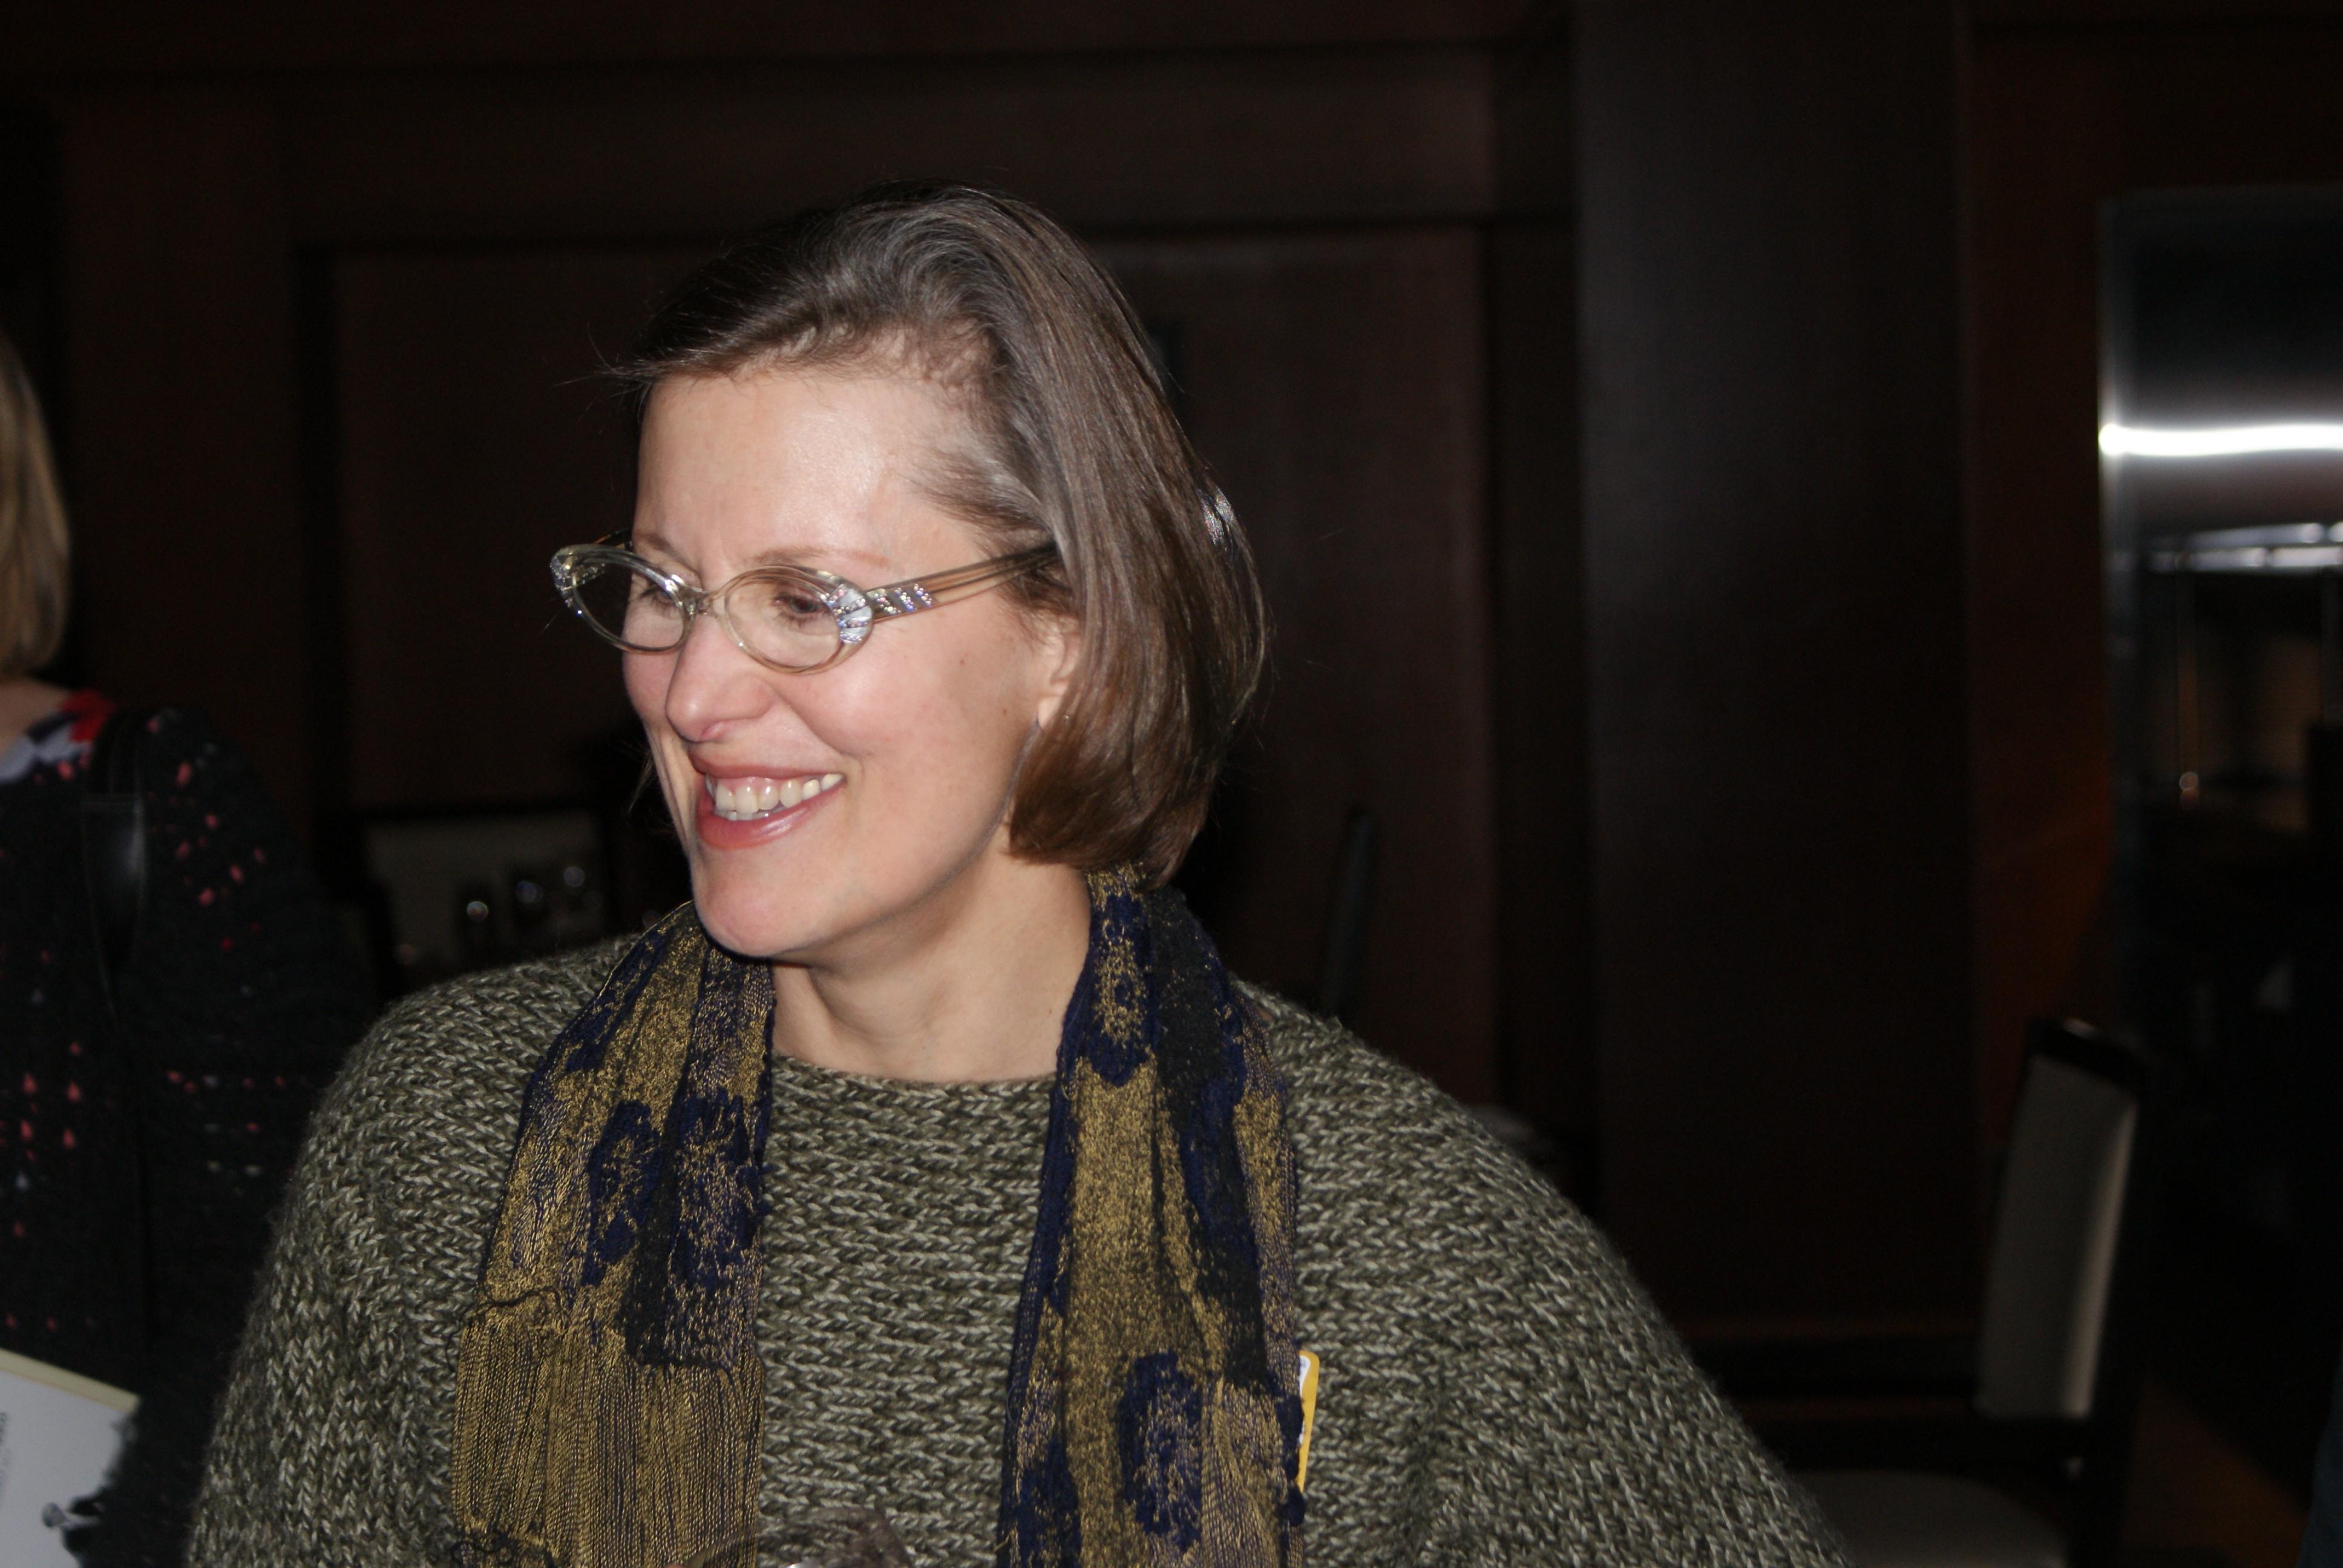 Linda Koutsky Bilder News Infos Aus Dem Web